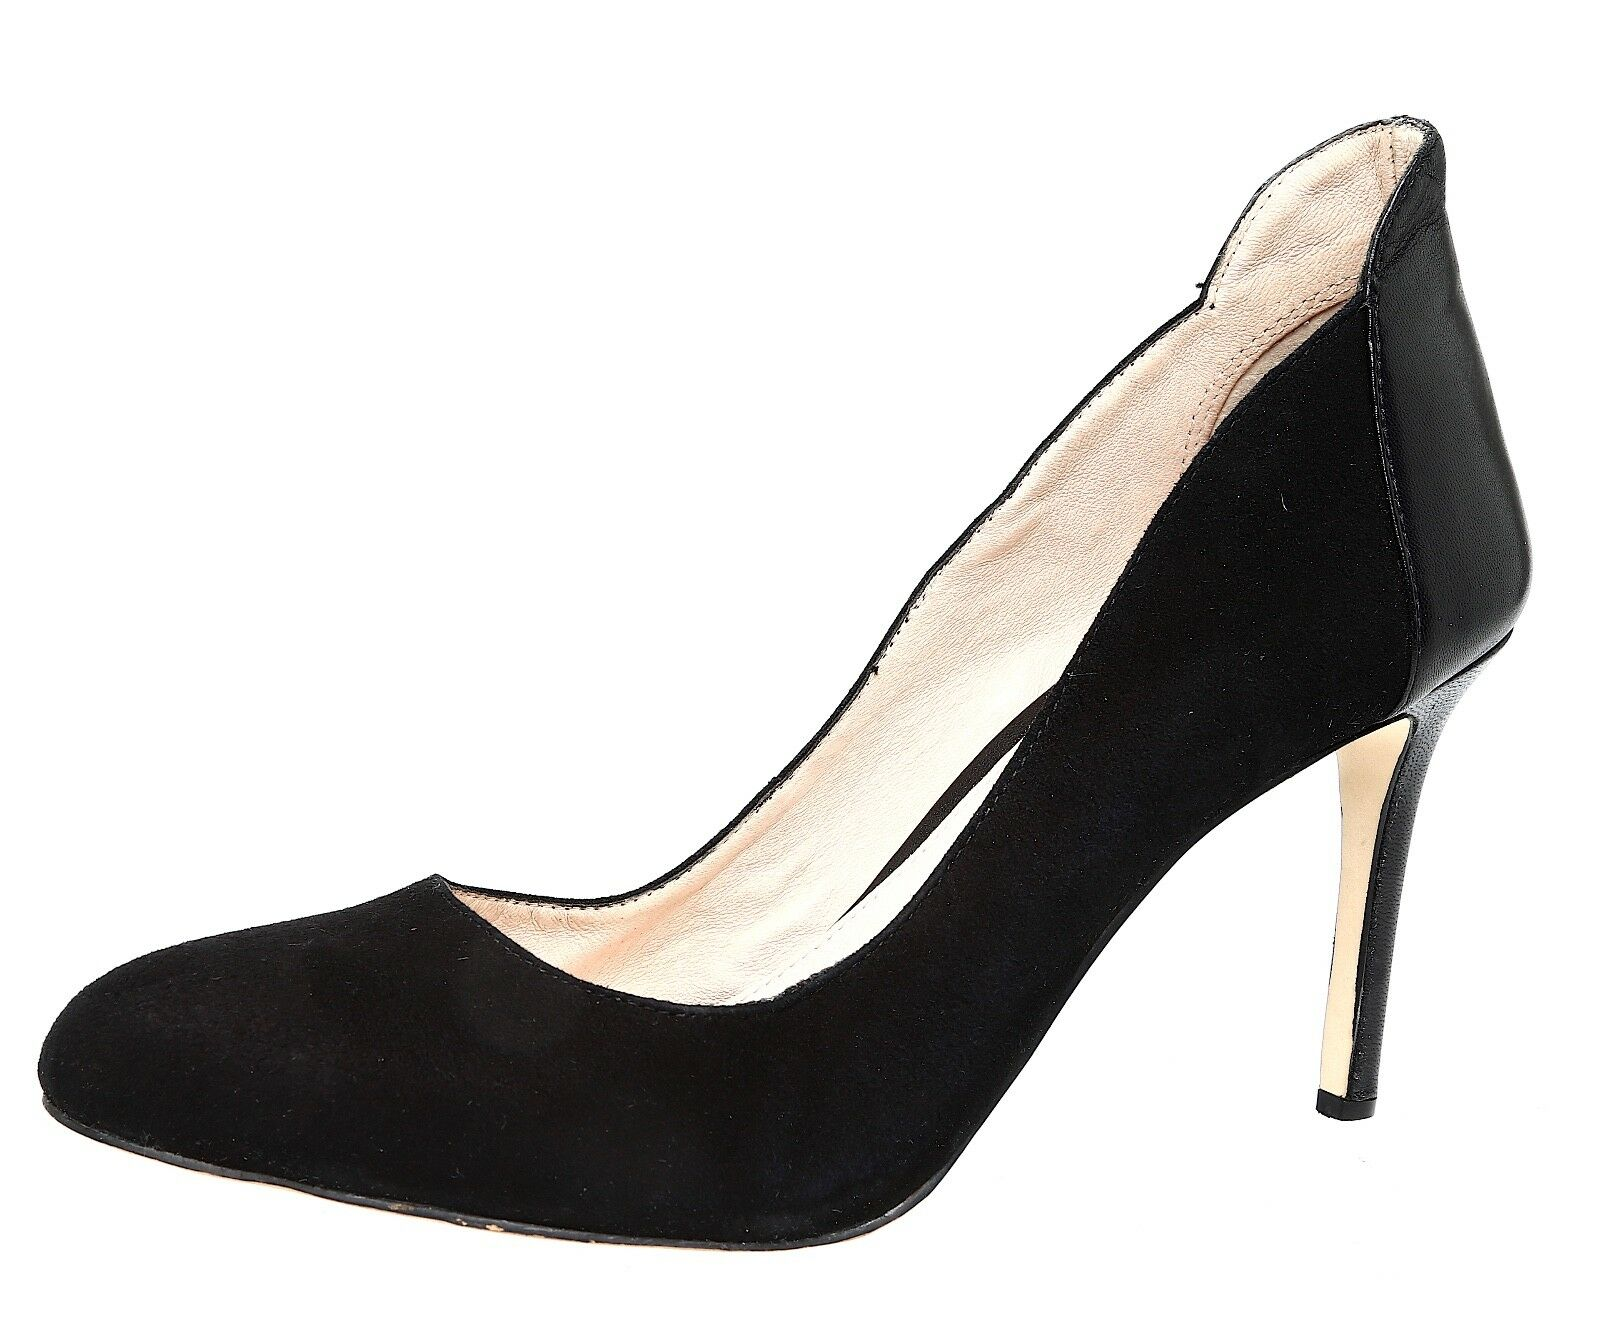 Louise Et Cie Hydrangea 2618 Suede Pump Black Women Sz 9 M 2618 Hydrangea e60867